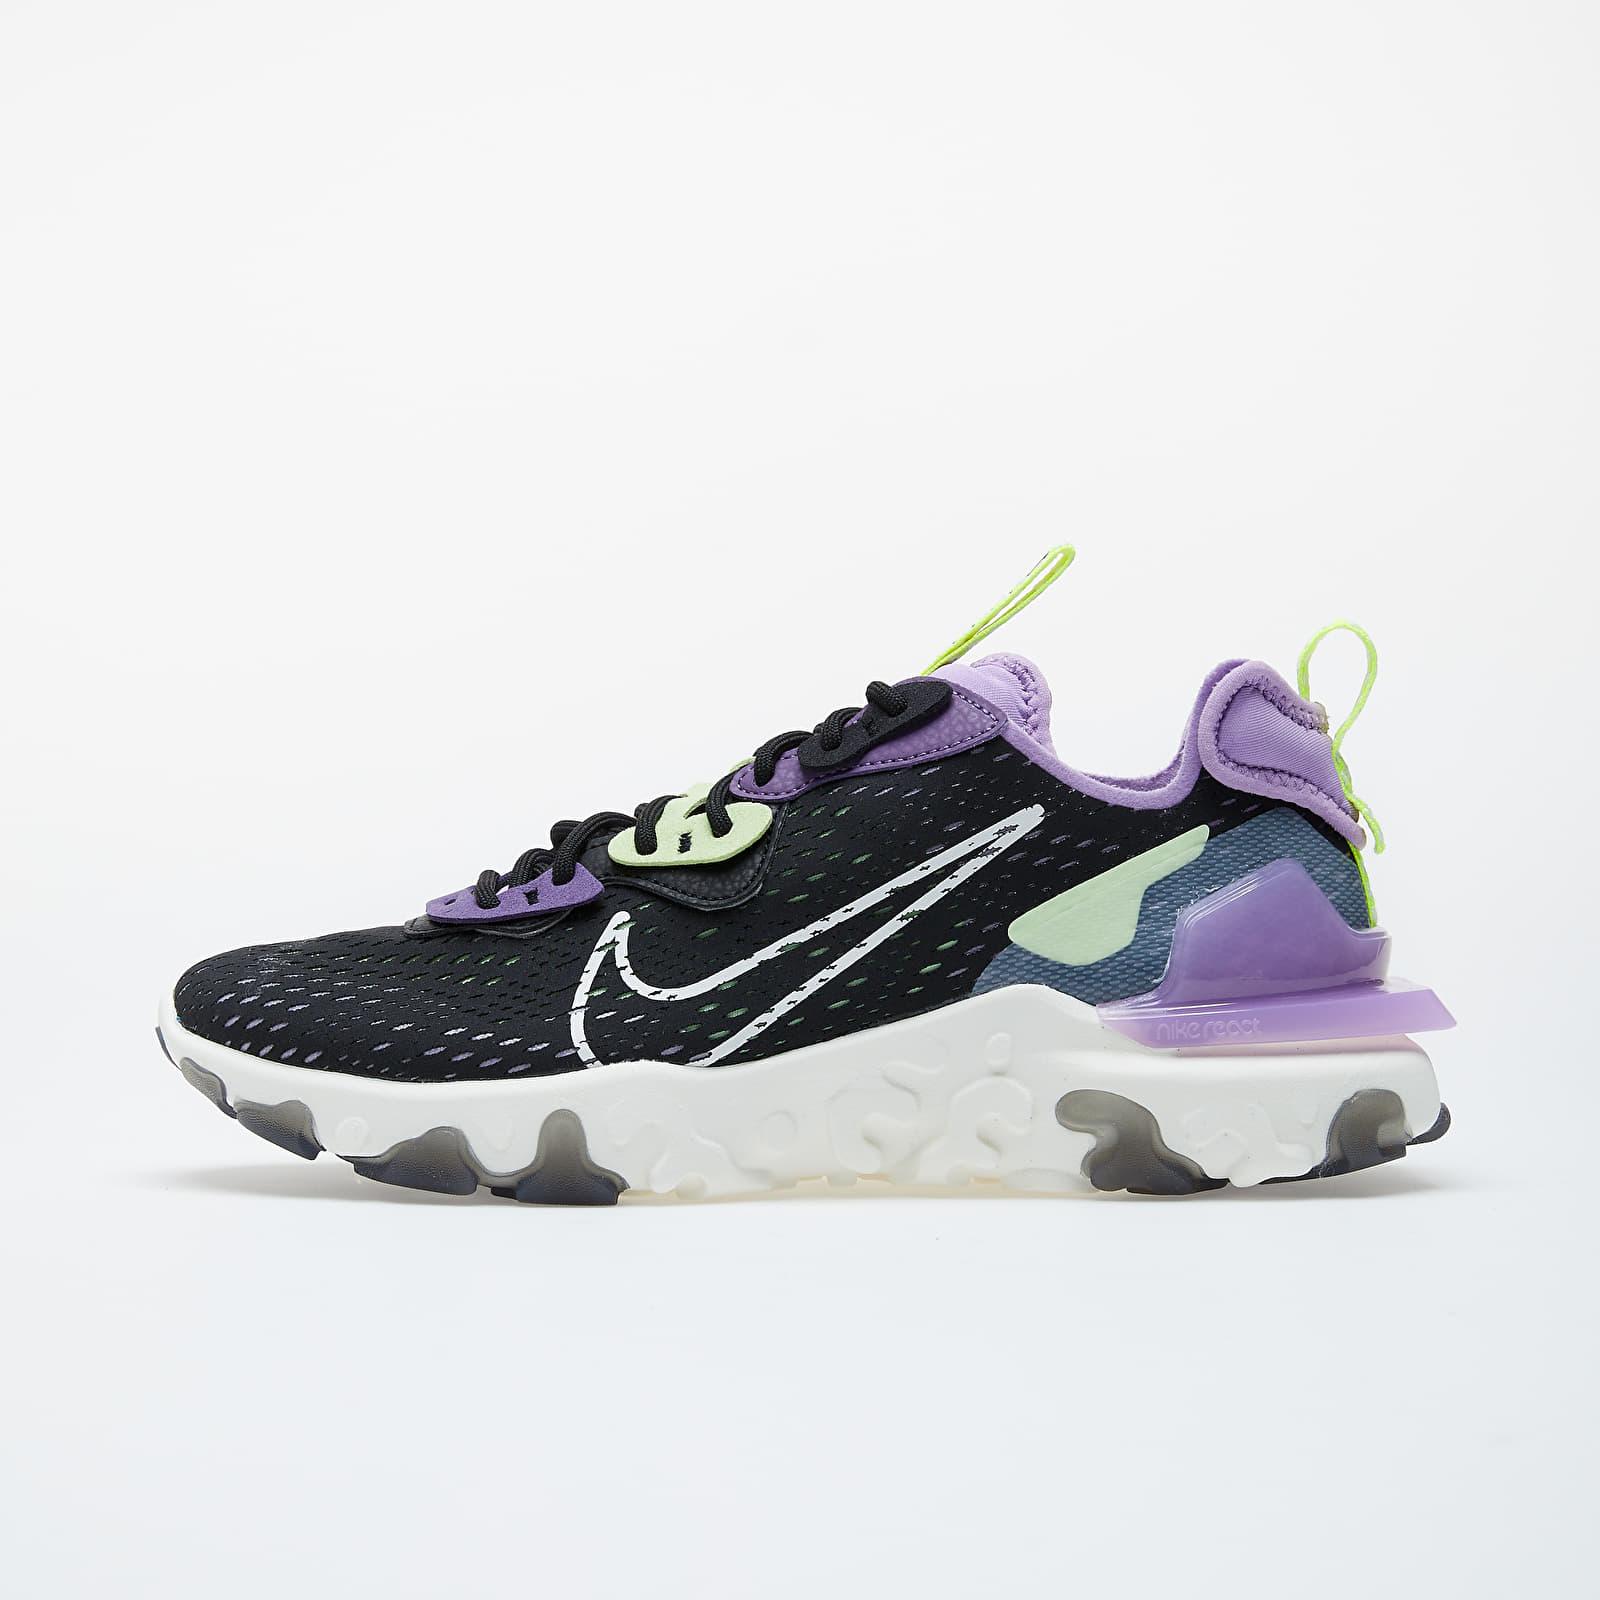 Pánské tenisky a boty Nike React Vision Black/ Sail-Dk Smoke Grey-Gravity Purple